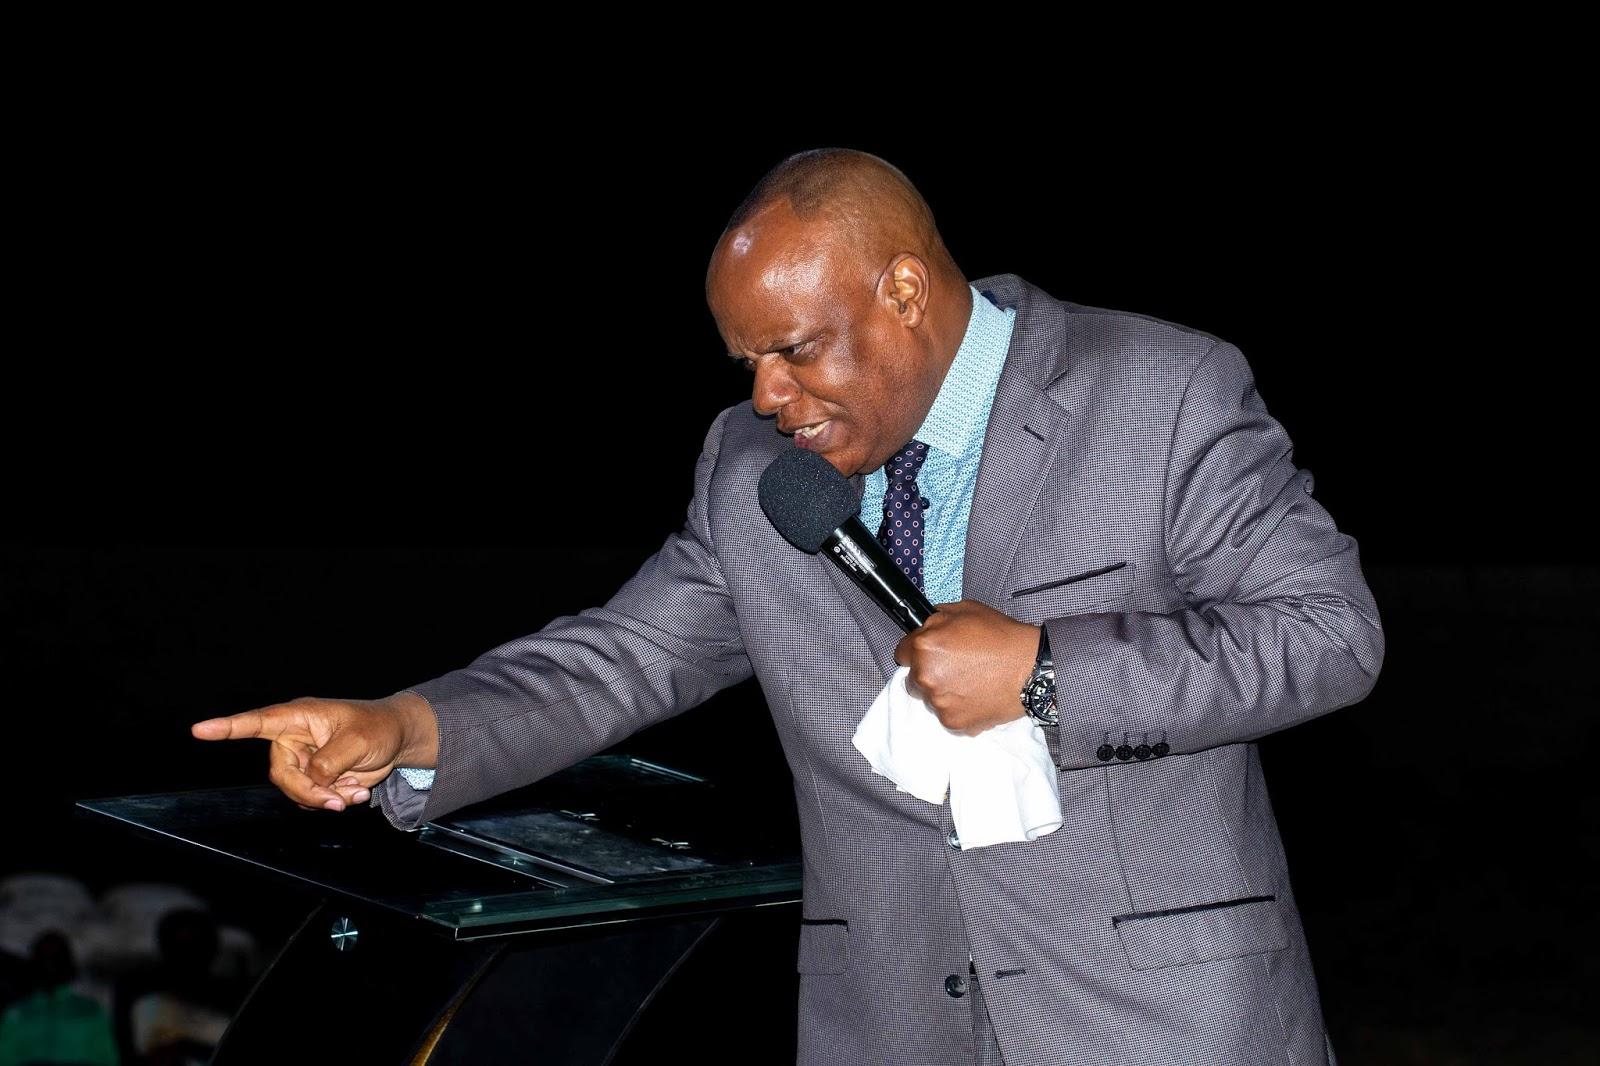 Minister's Profile - Apostle Alexander Chisango